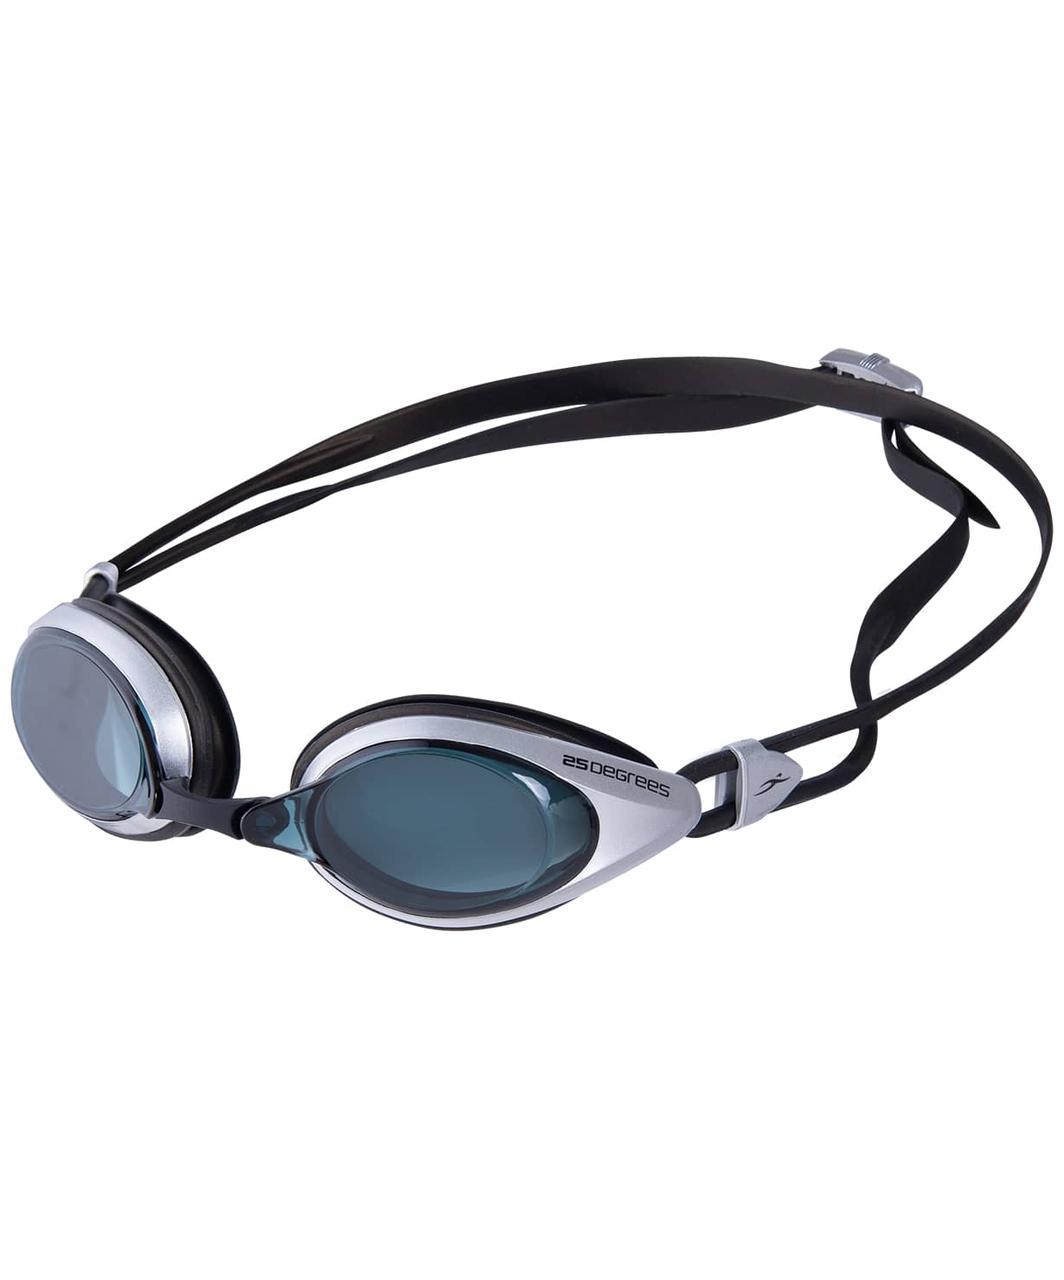 Очки для плавания Pulso White/Black 25Degrees